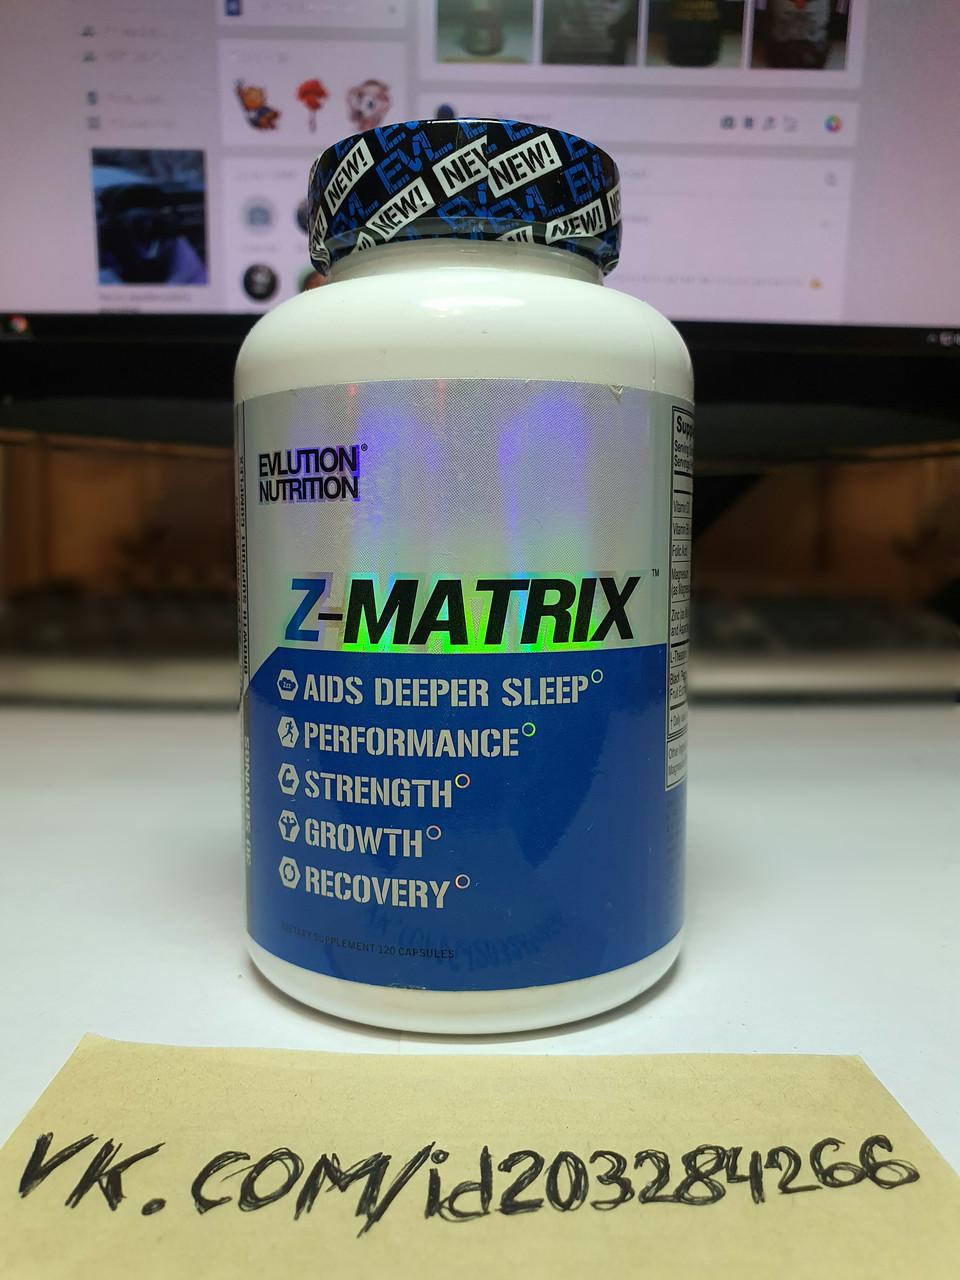 Бустер тестостерона EVLution Nutrition Z-Matrix 120 Capsules